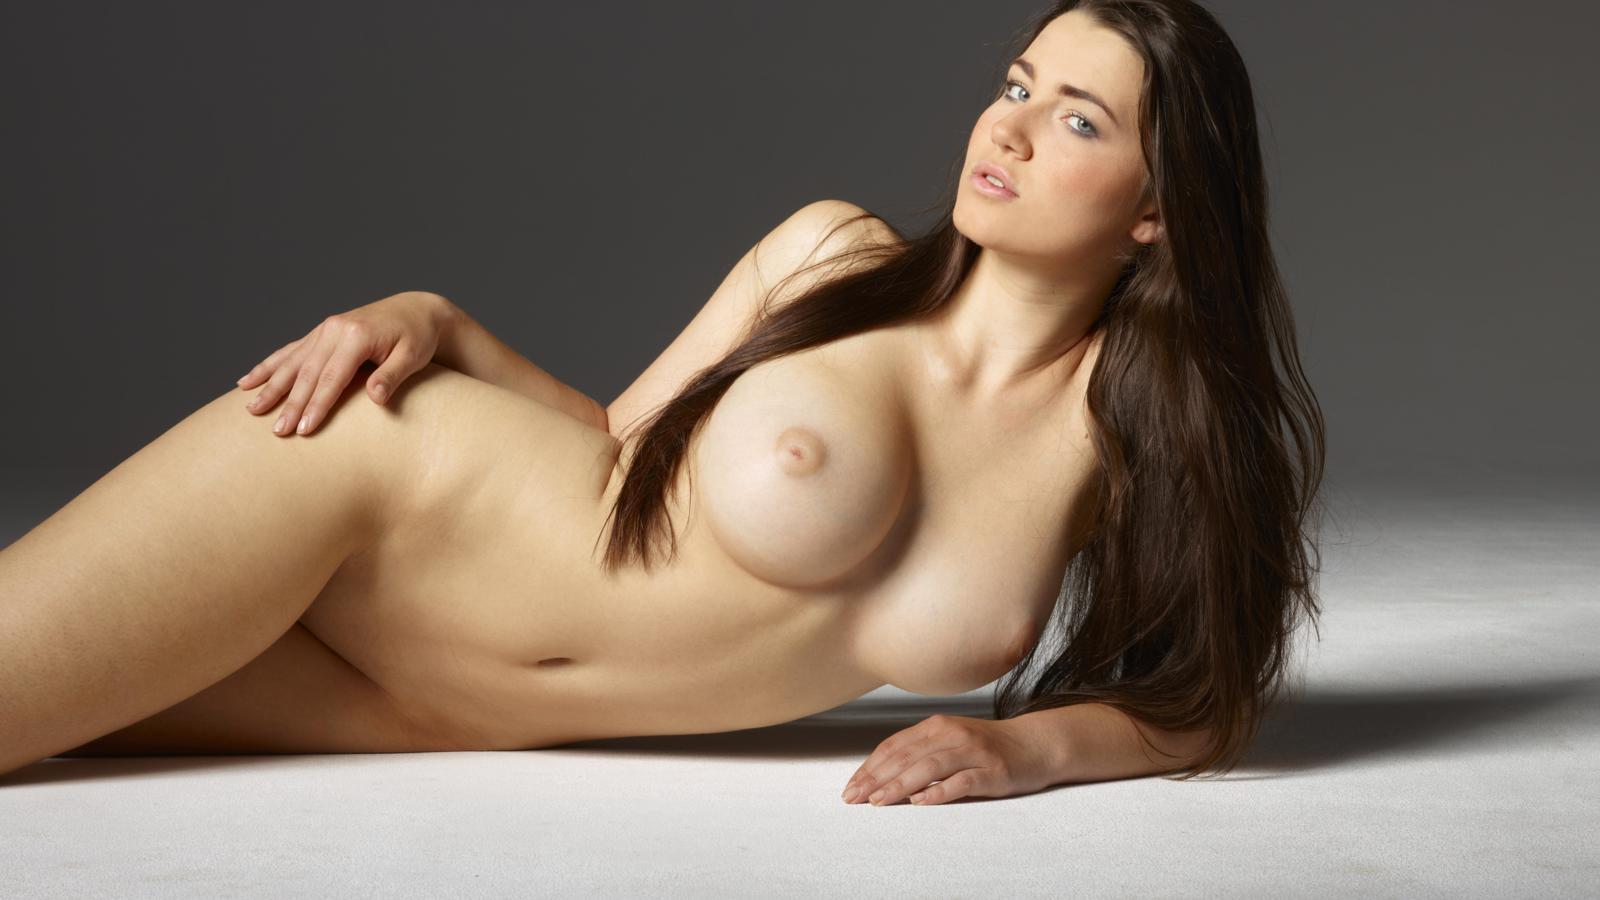 chubby backass naked girls